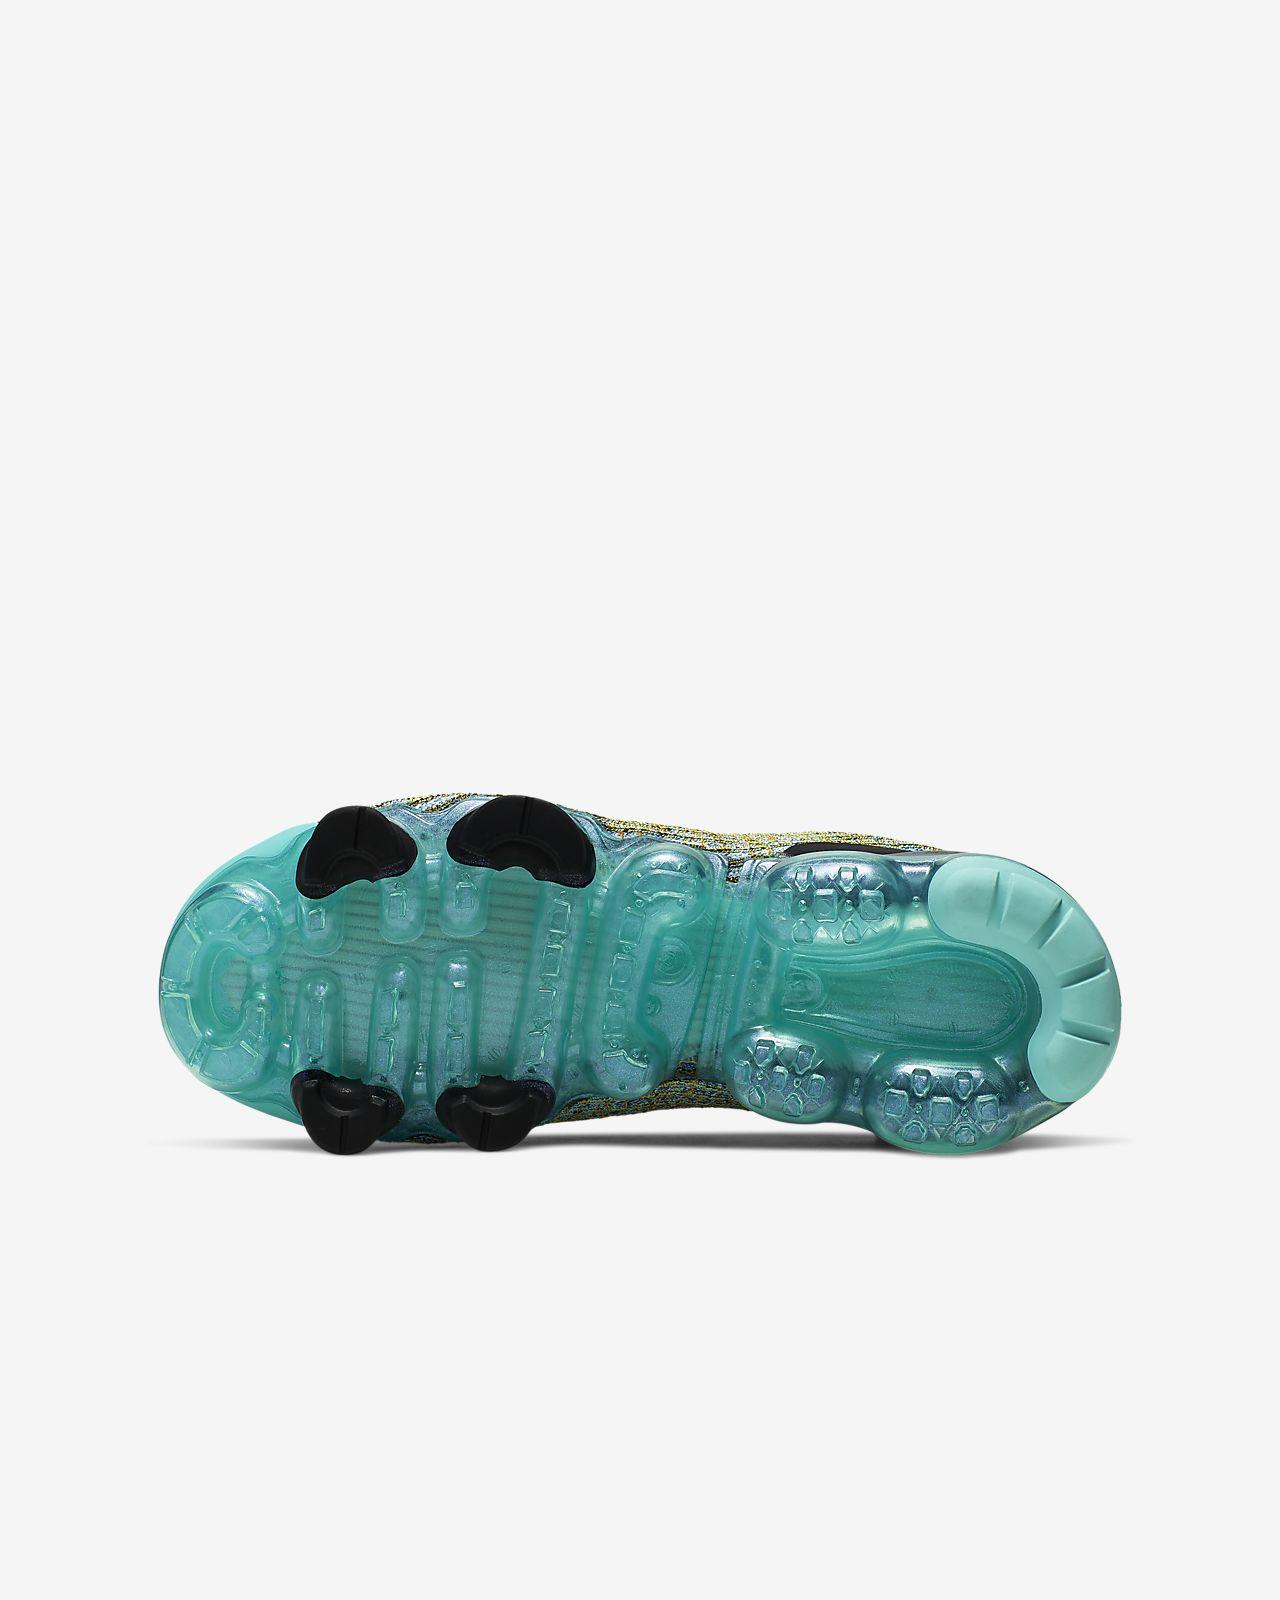 new arrival 45c61 ee533 Nike Air VaporMax Flyknit 3 Older Kids' Shoe